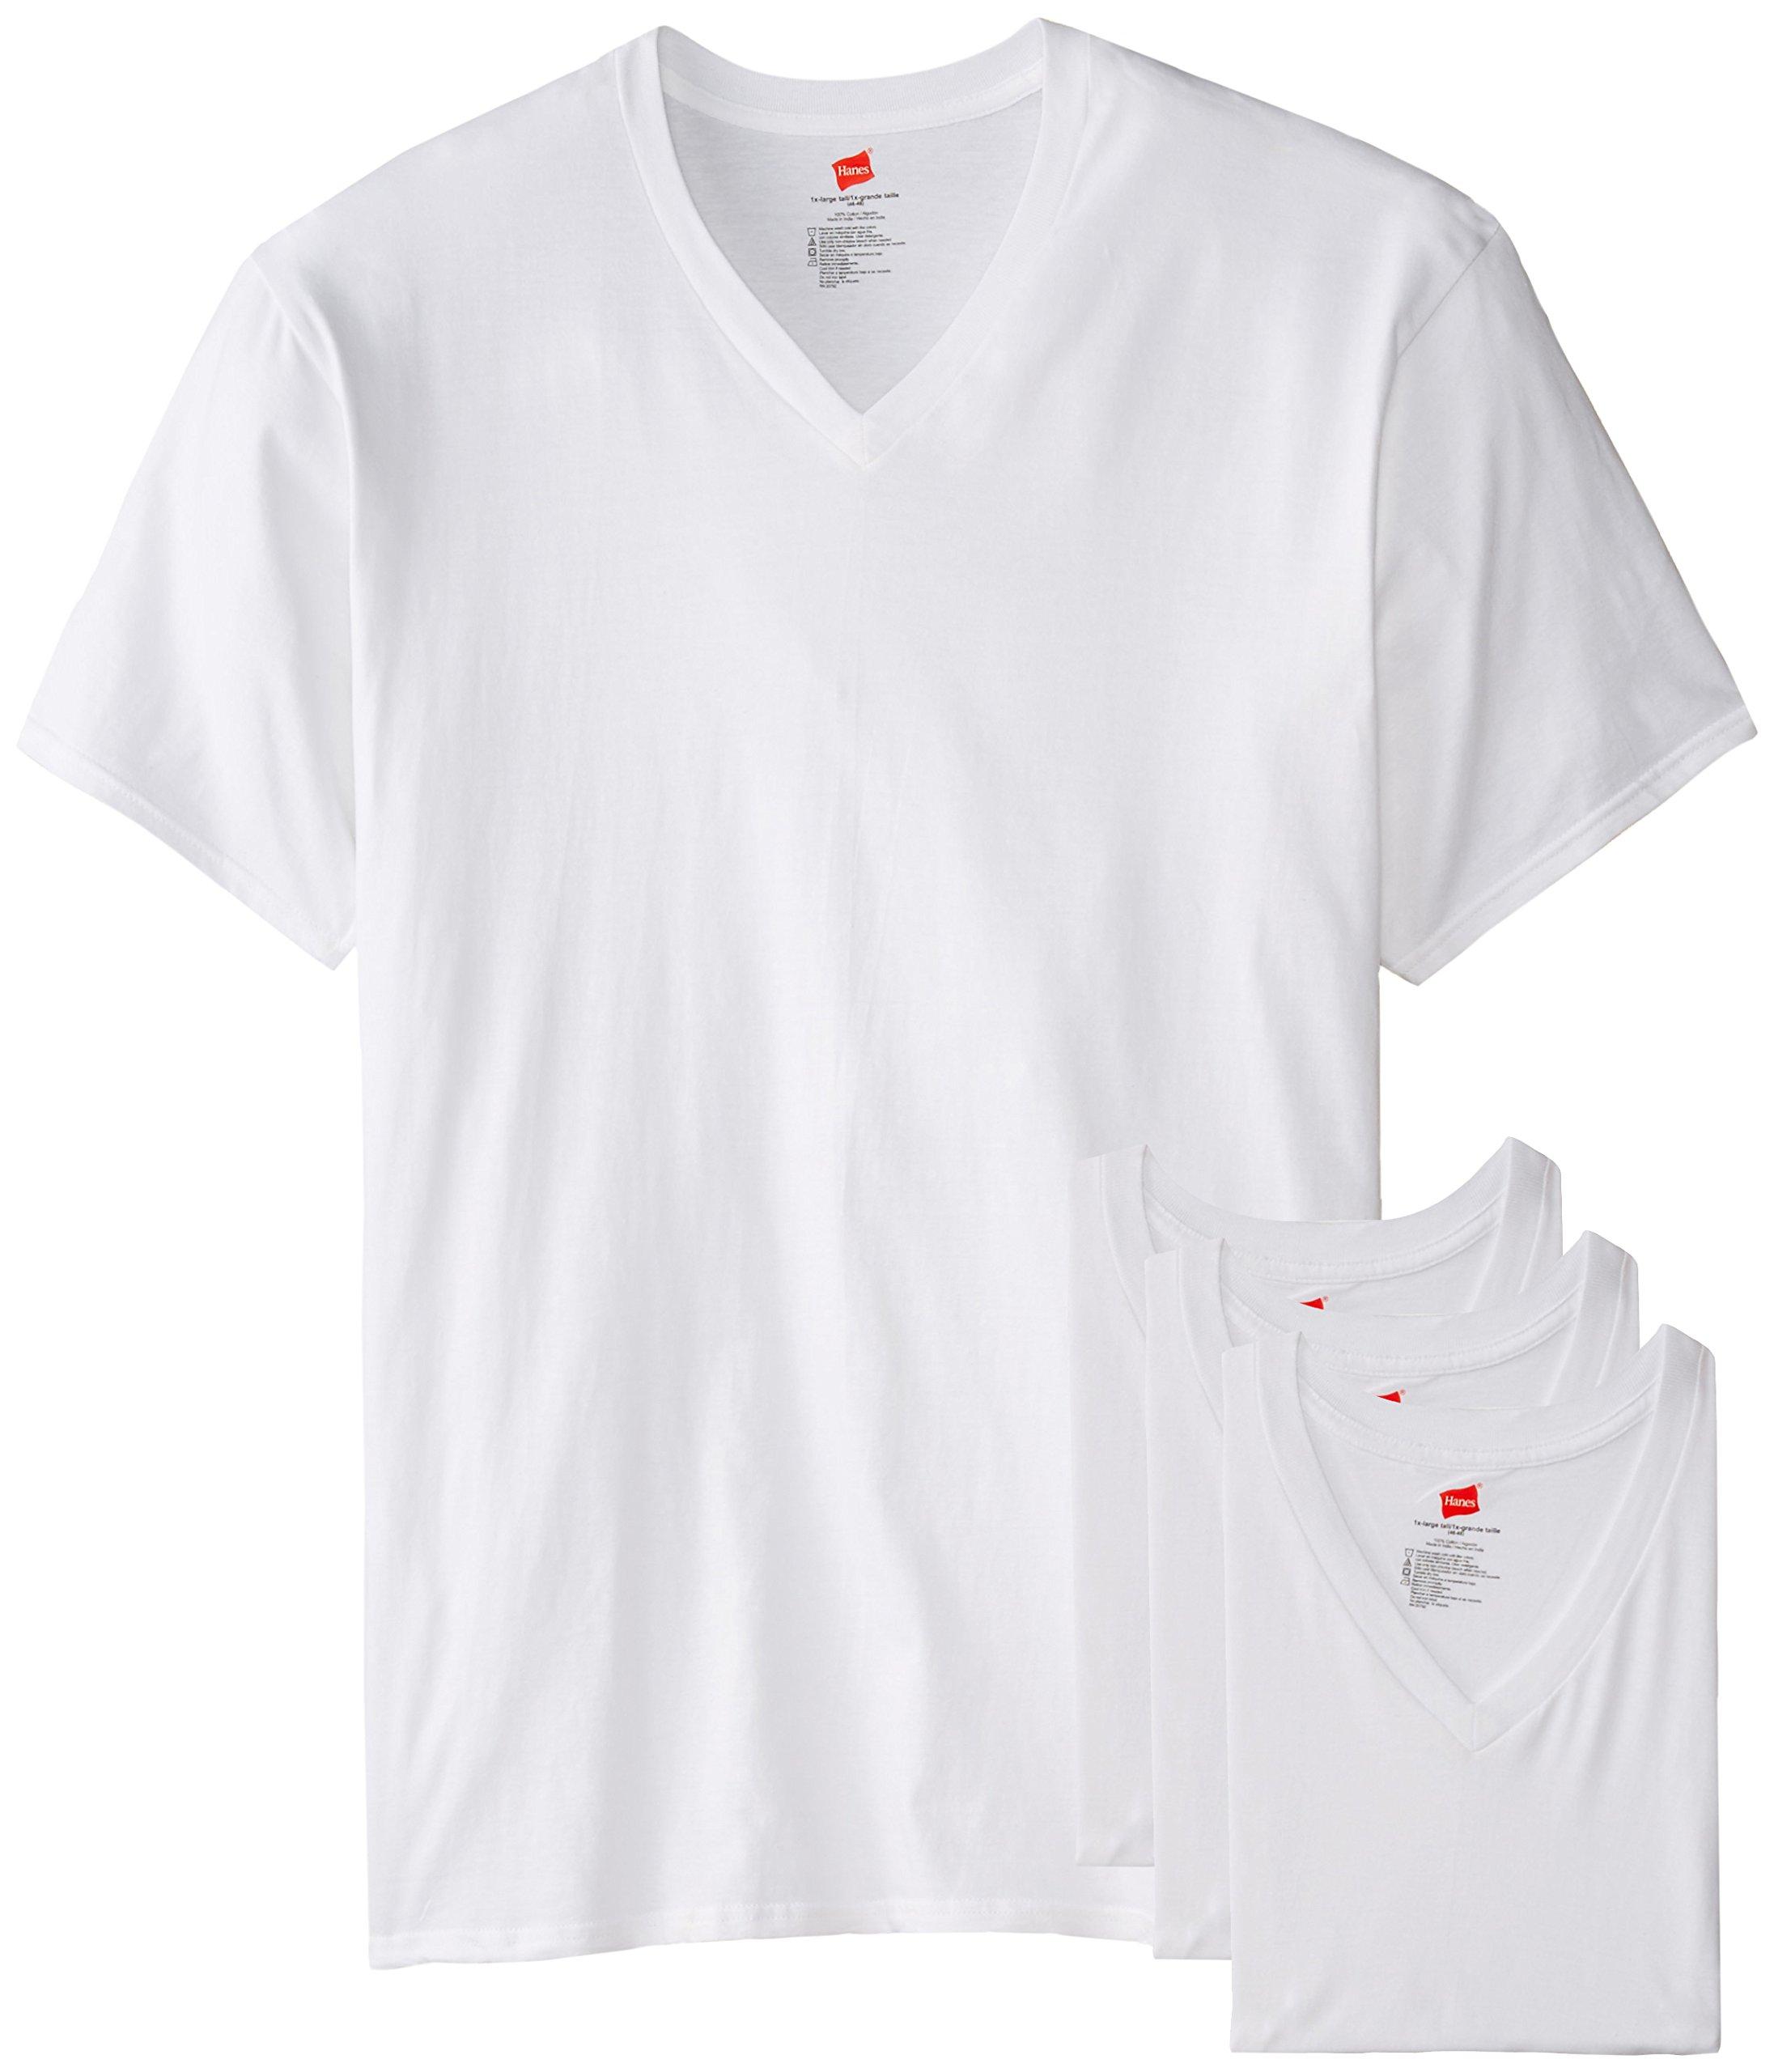 Hanes Men's Tall Man V-Neck T-Shirt (Pack of 3)